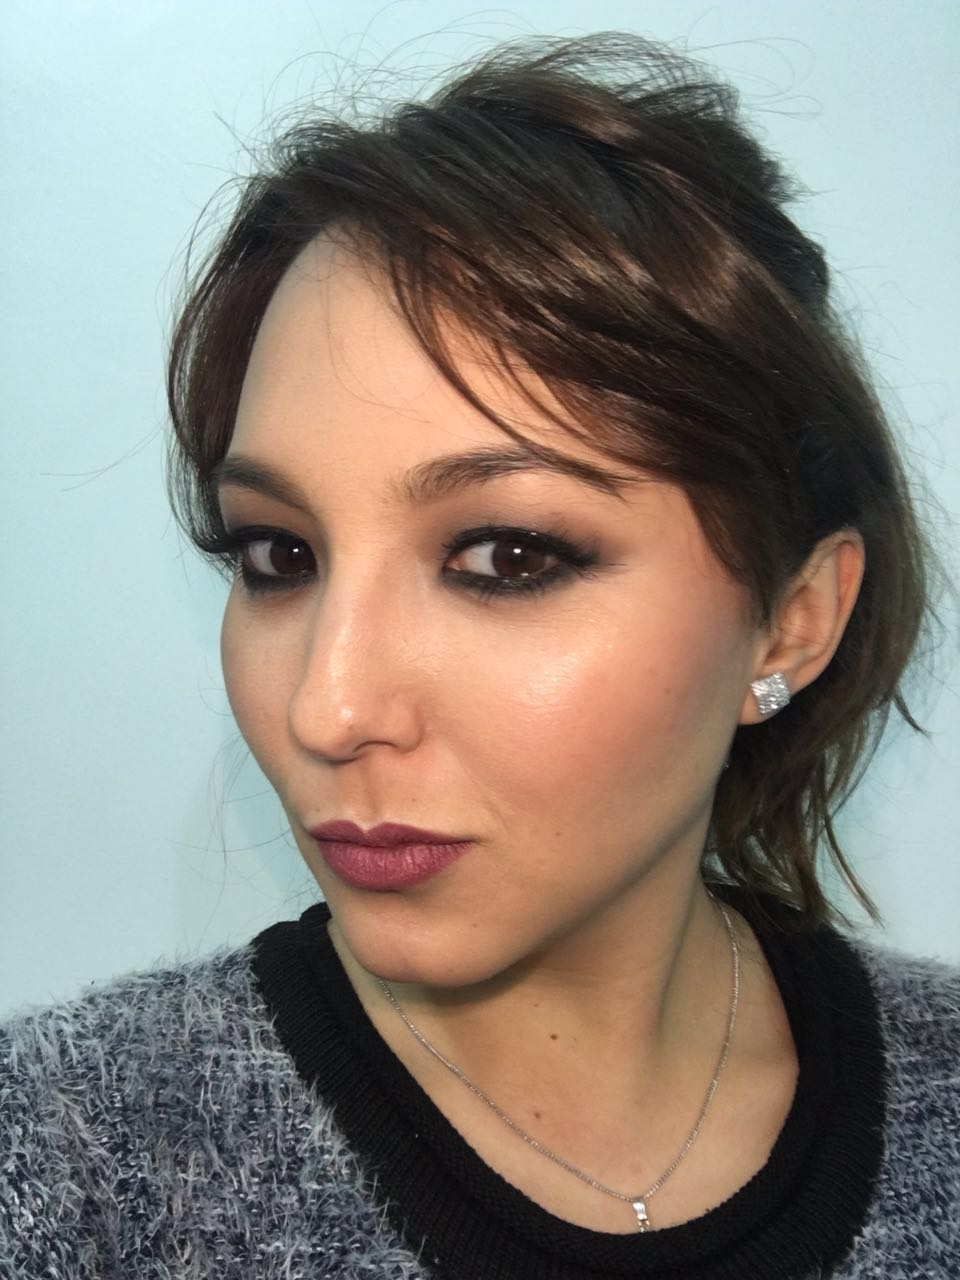 get-the-look-bruna-nakano-cabelo-curto-castanho1